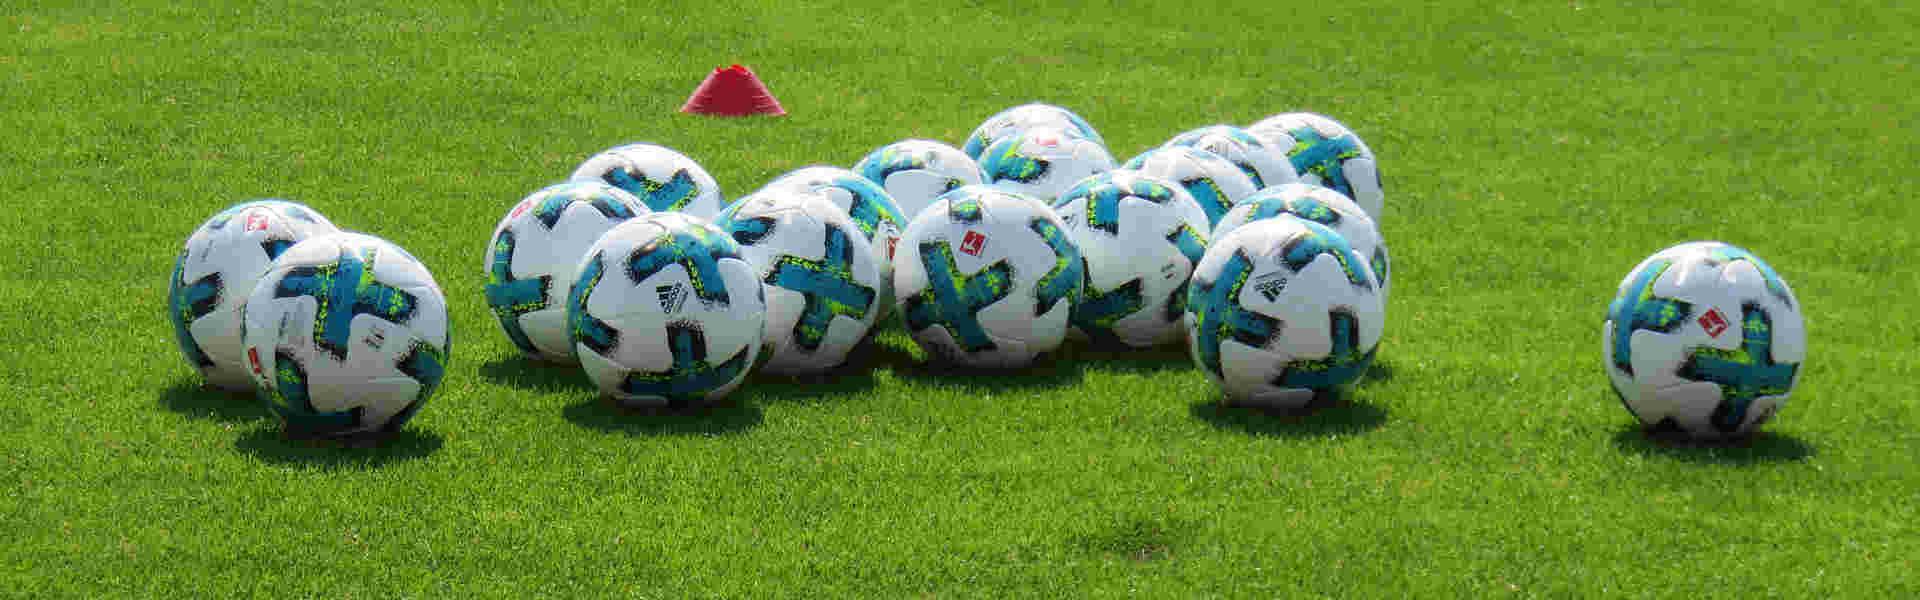 Fussball Tsv Burghaslach